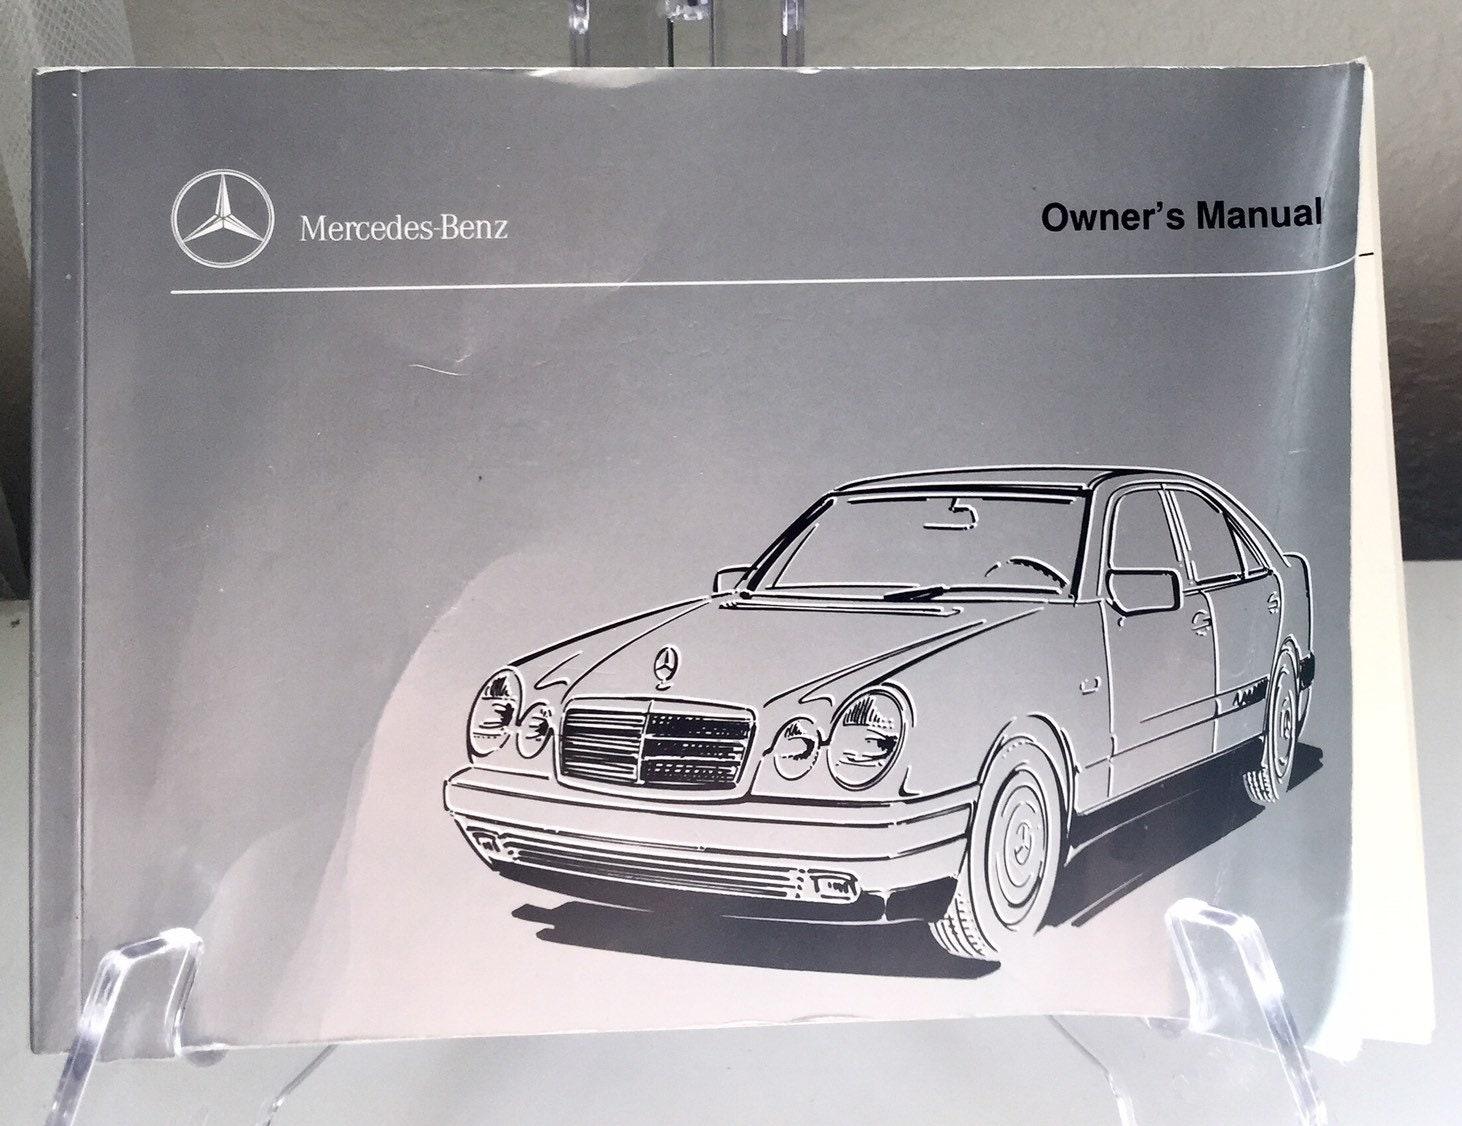 1997 mercedes e class models operator owner manual e300d e320 e420 rh  modmodstudio com 1989 Mercedes-Benz E 320 1997 Mercedes-Benz a Class